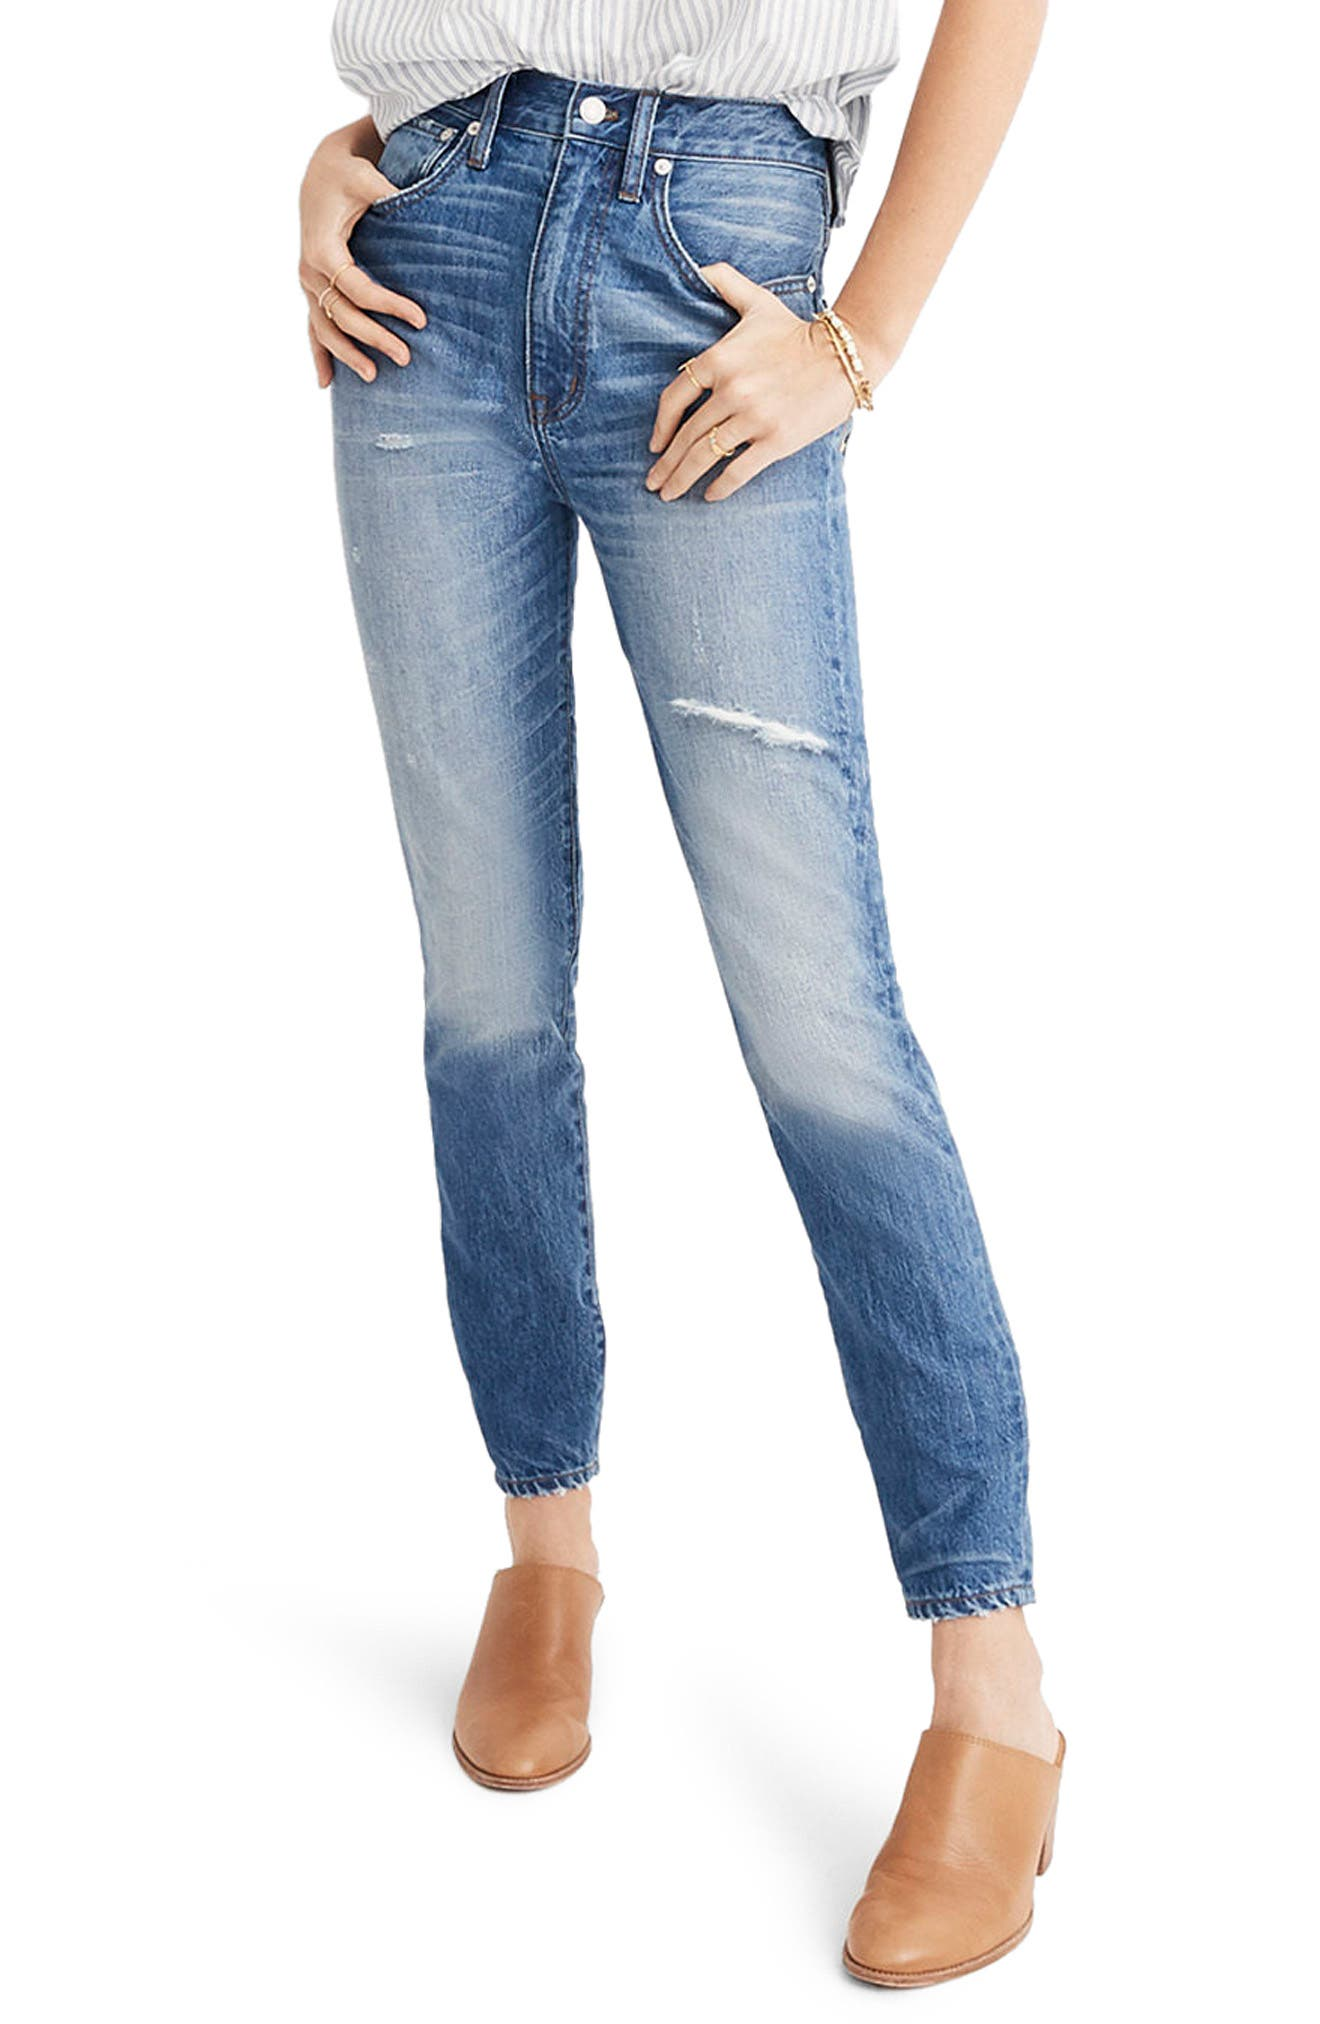 Women's Madewell Rigid High Waist Skinny Jeans